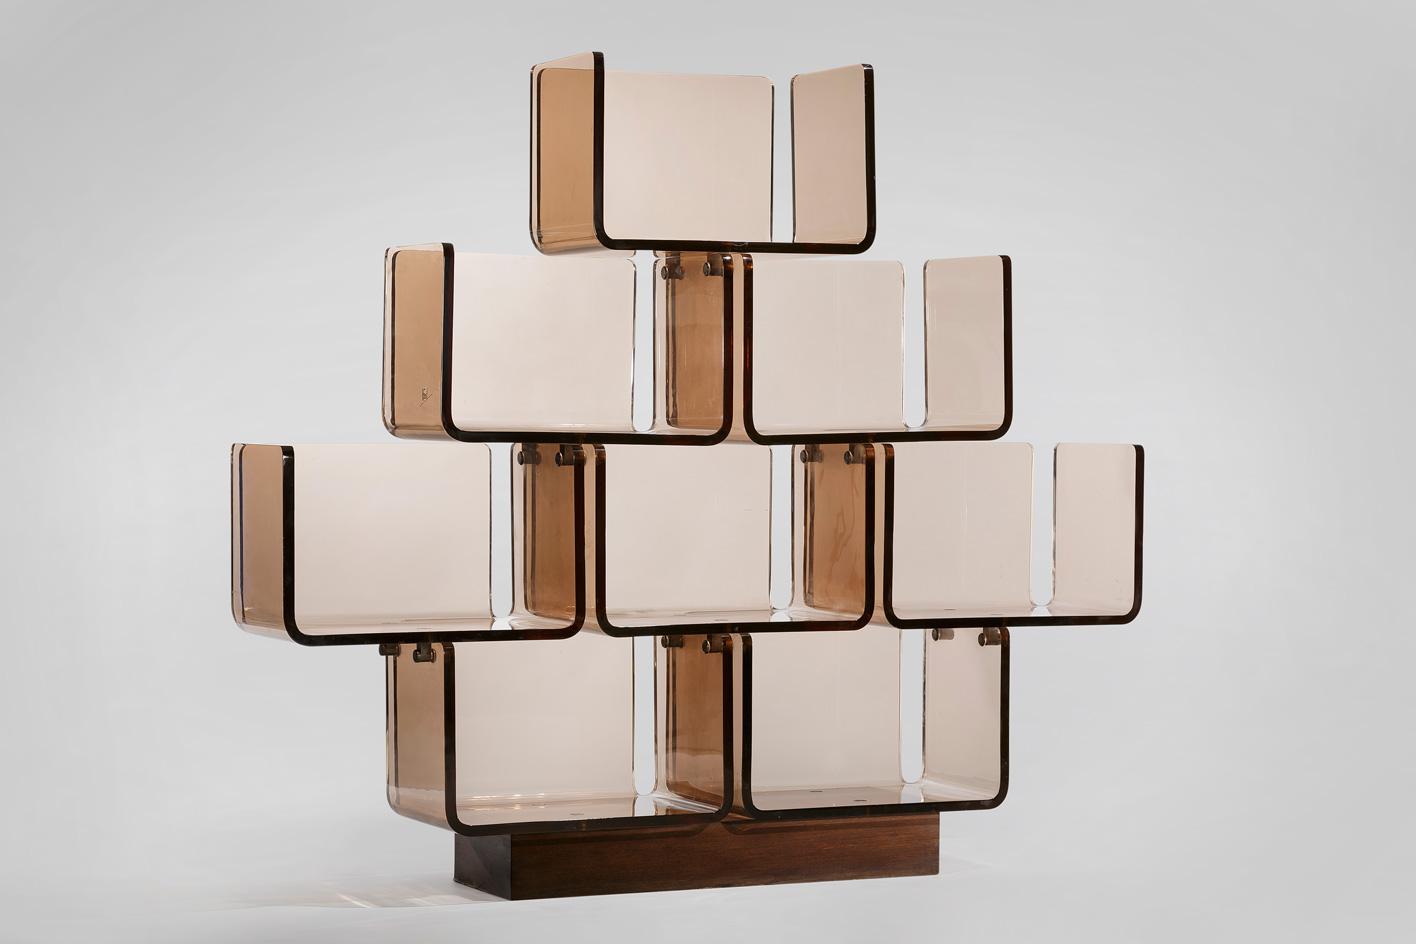 demisch danant 39 s new nyc space by rafael de cardenas wallpaper. Black Bedroom Furniture Sets. Home Design Ideas